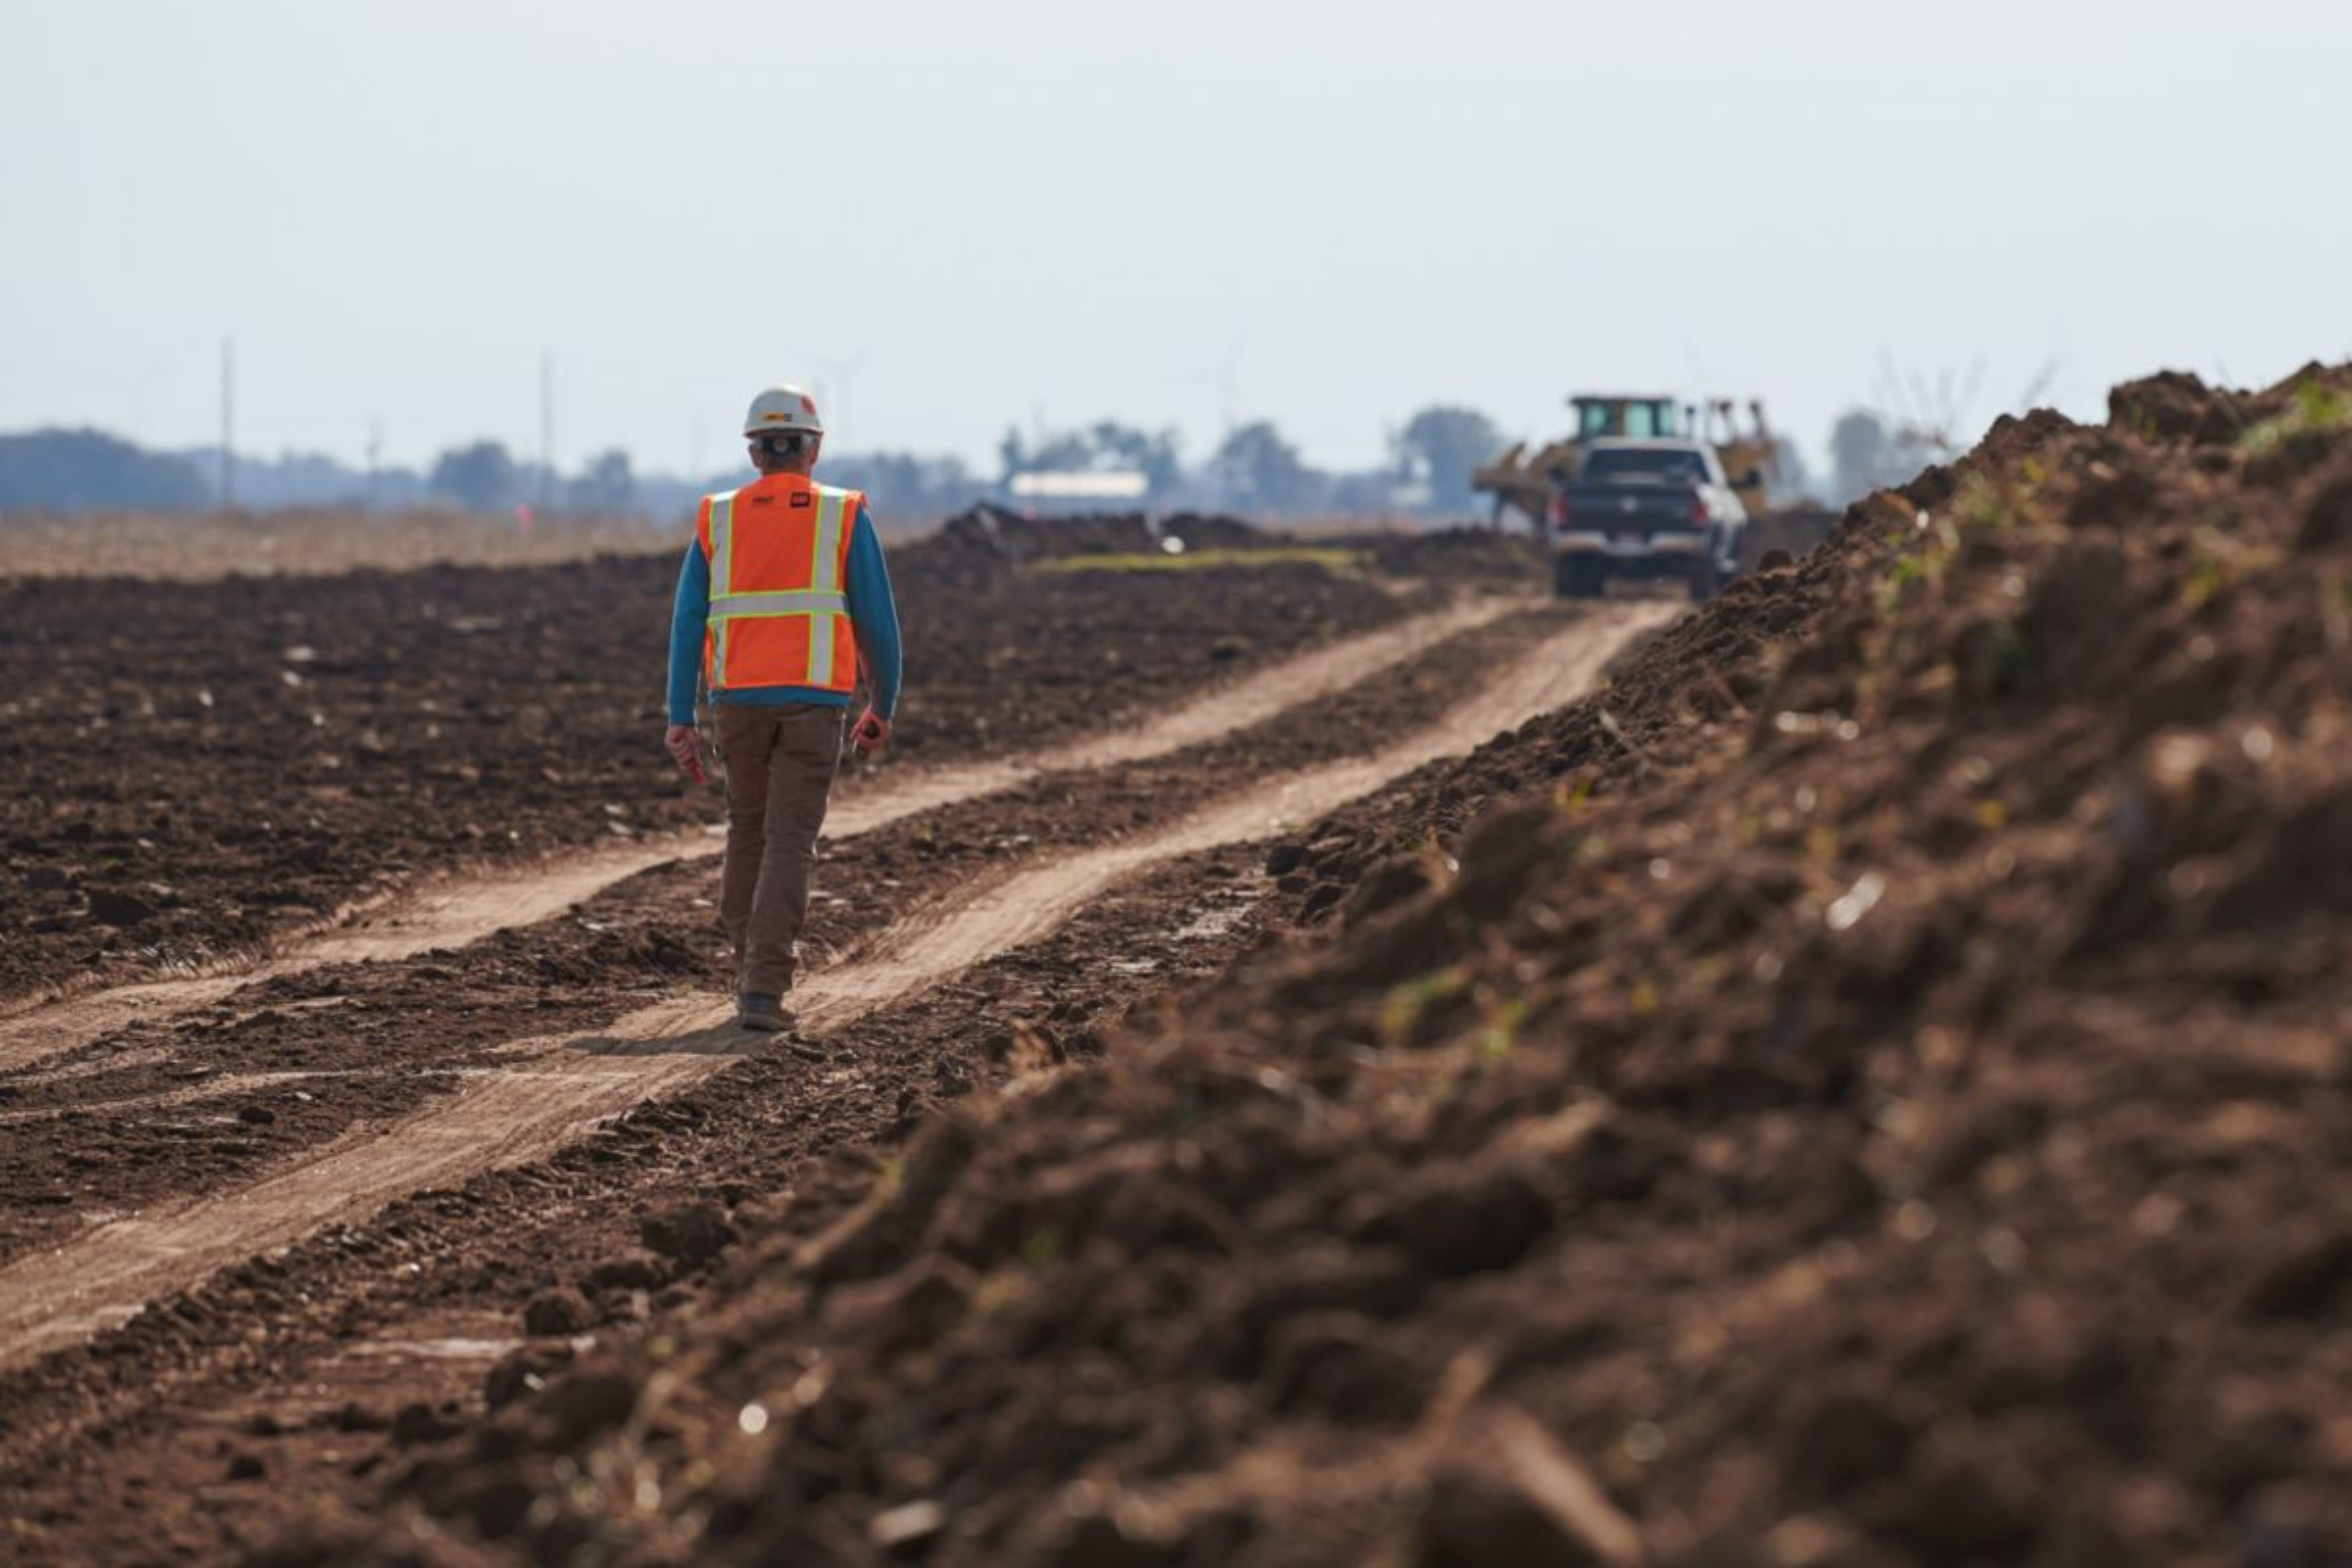 Operator walking on dirt road